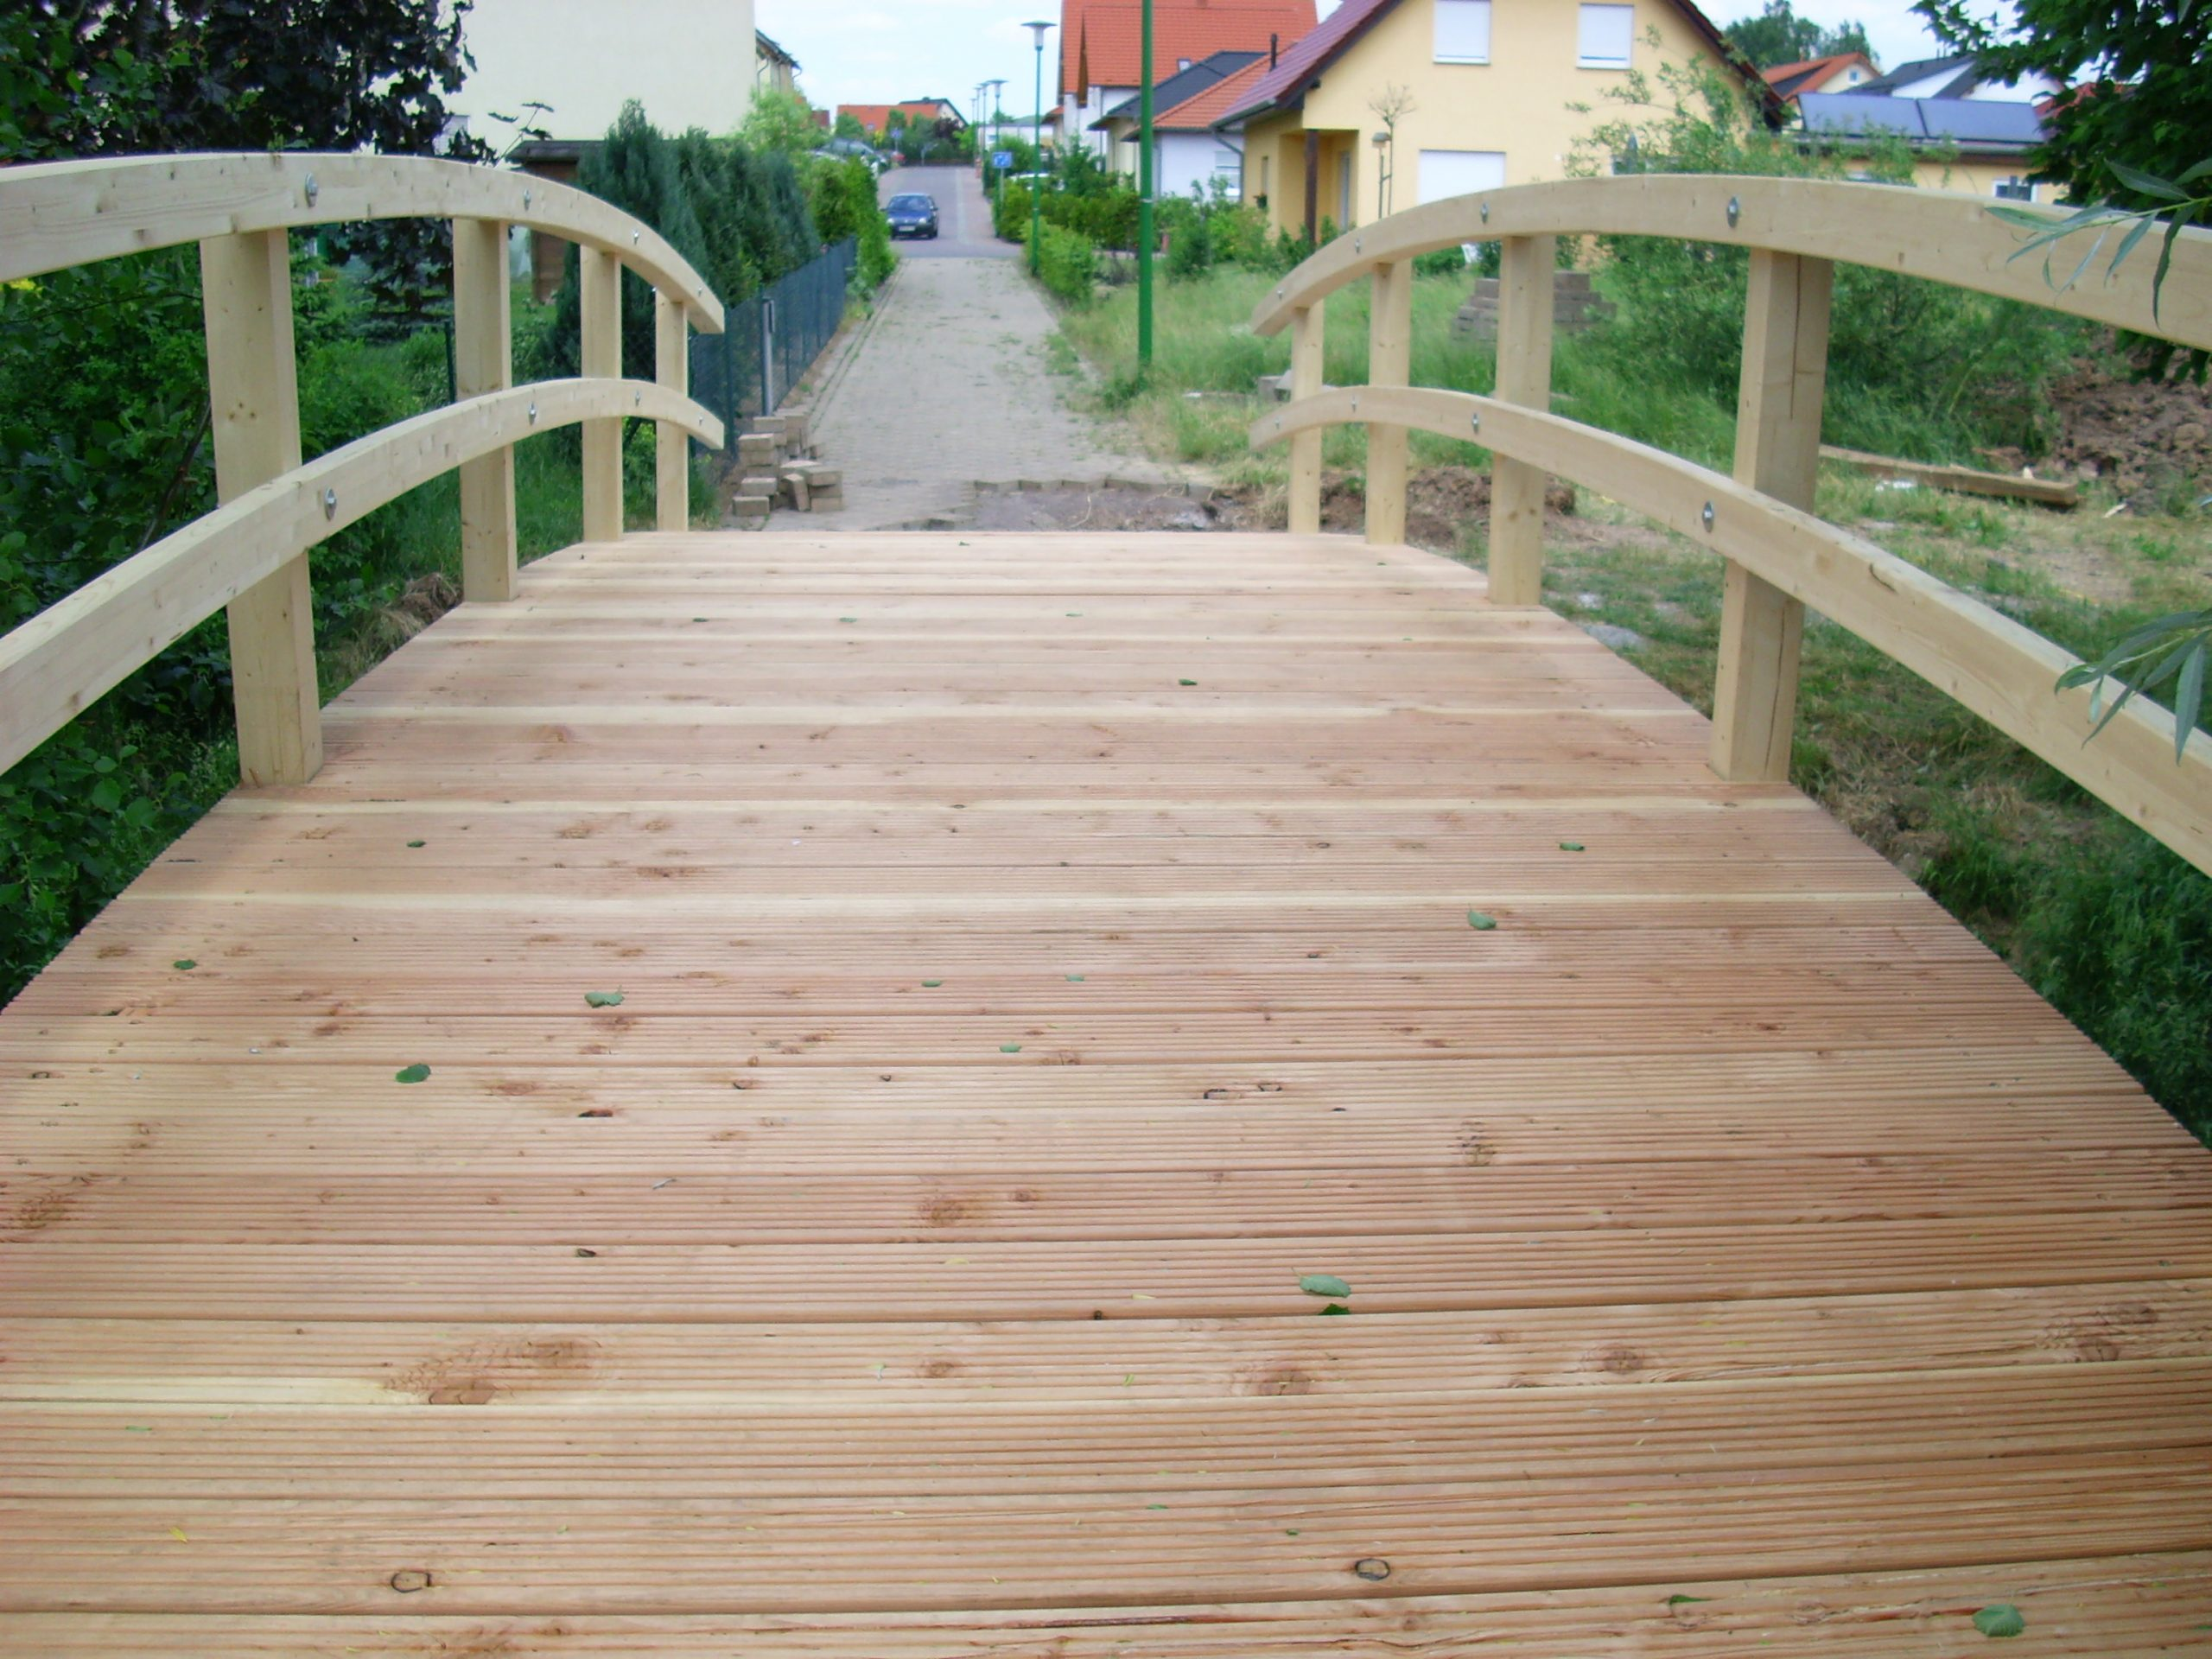 Brettschichtholz Bogenbinder Fußgängerbrücke